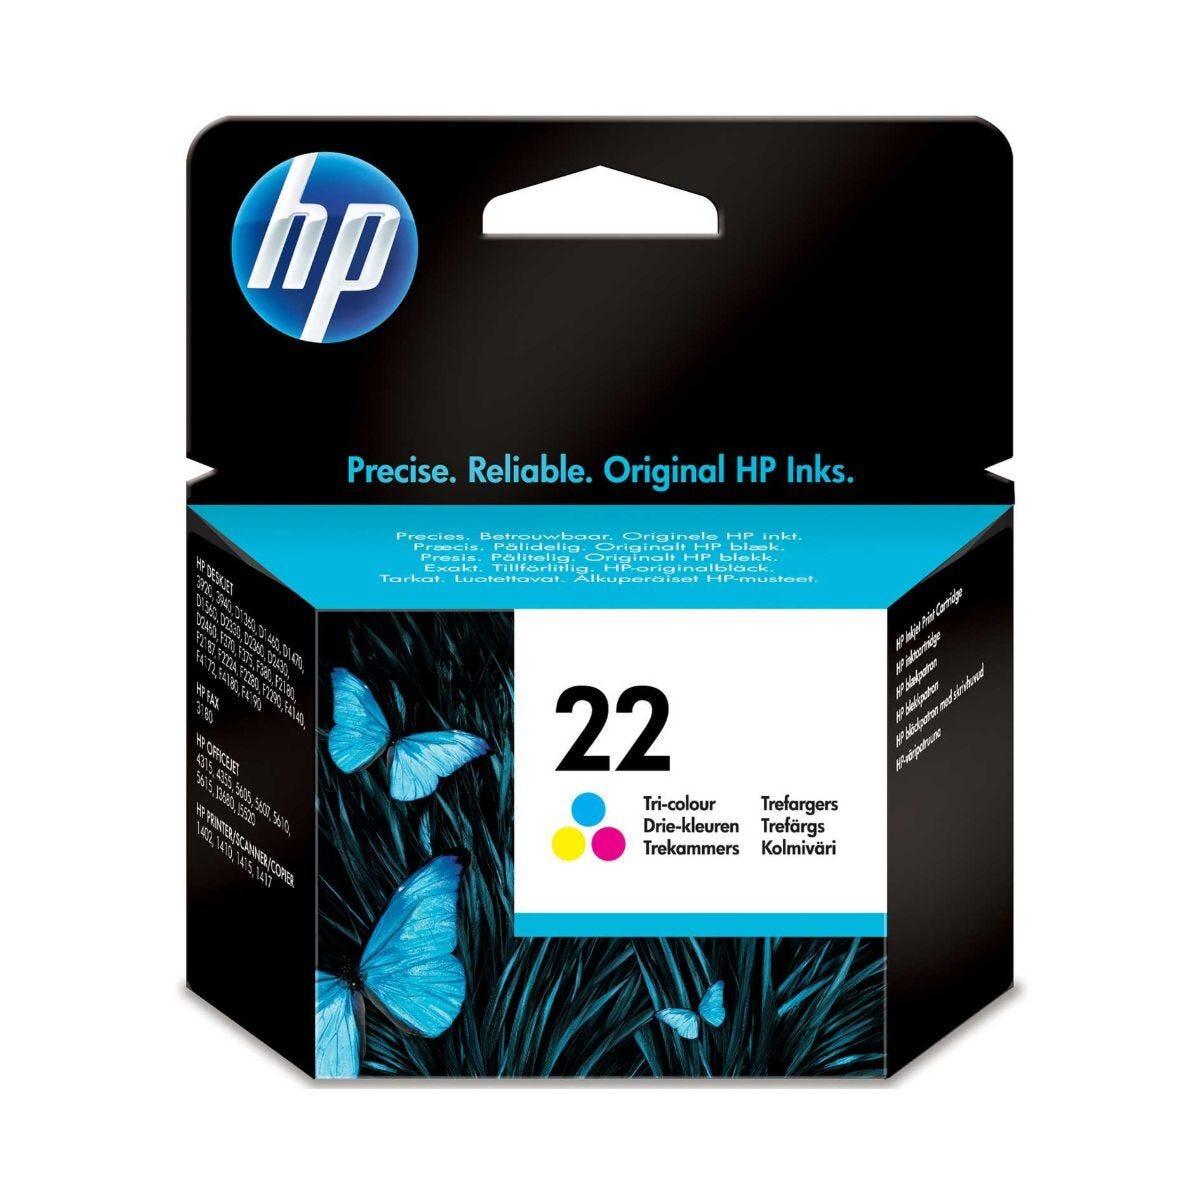 HP 22 Ink Cartridge 5ml